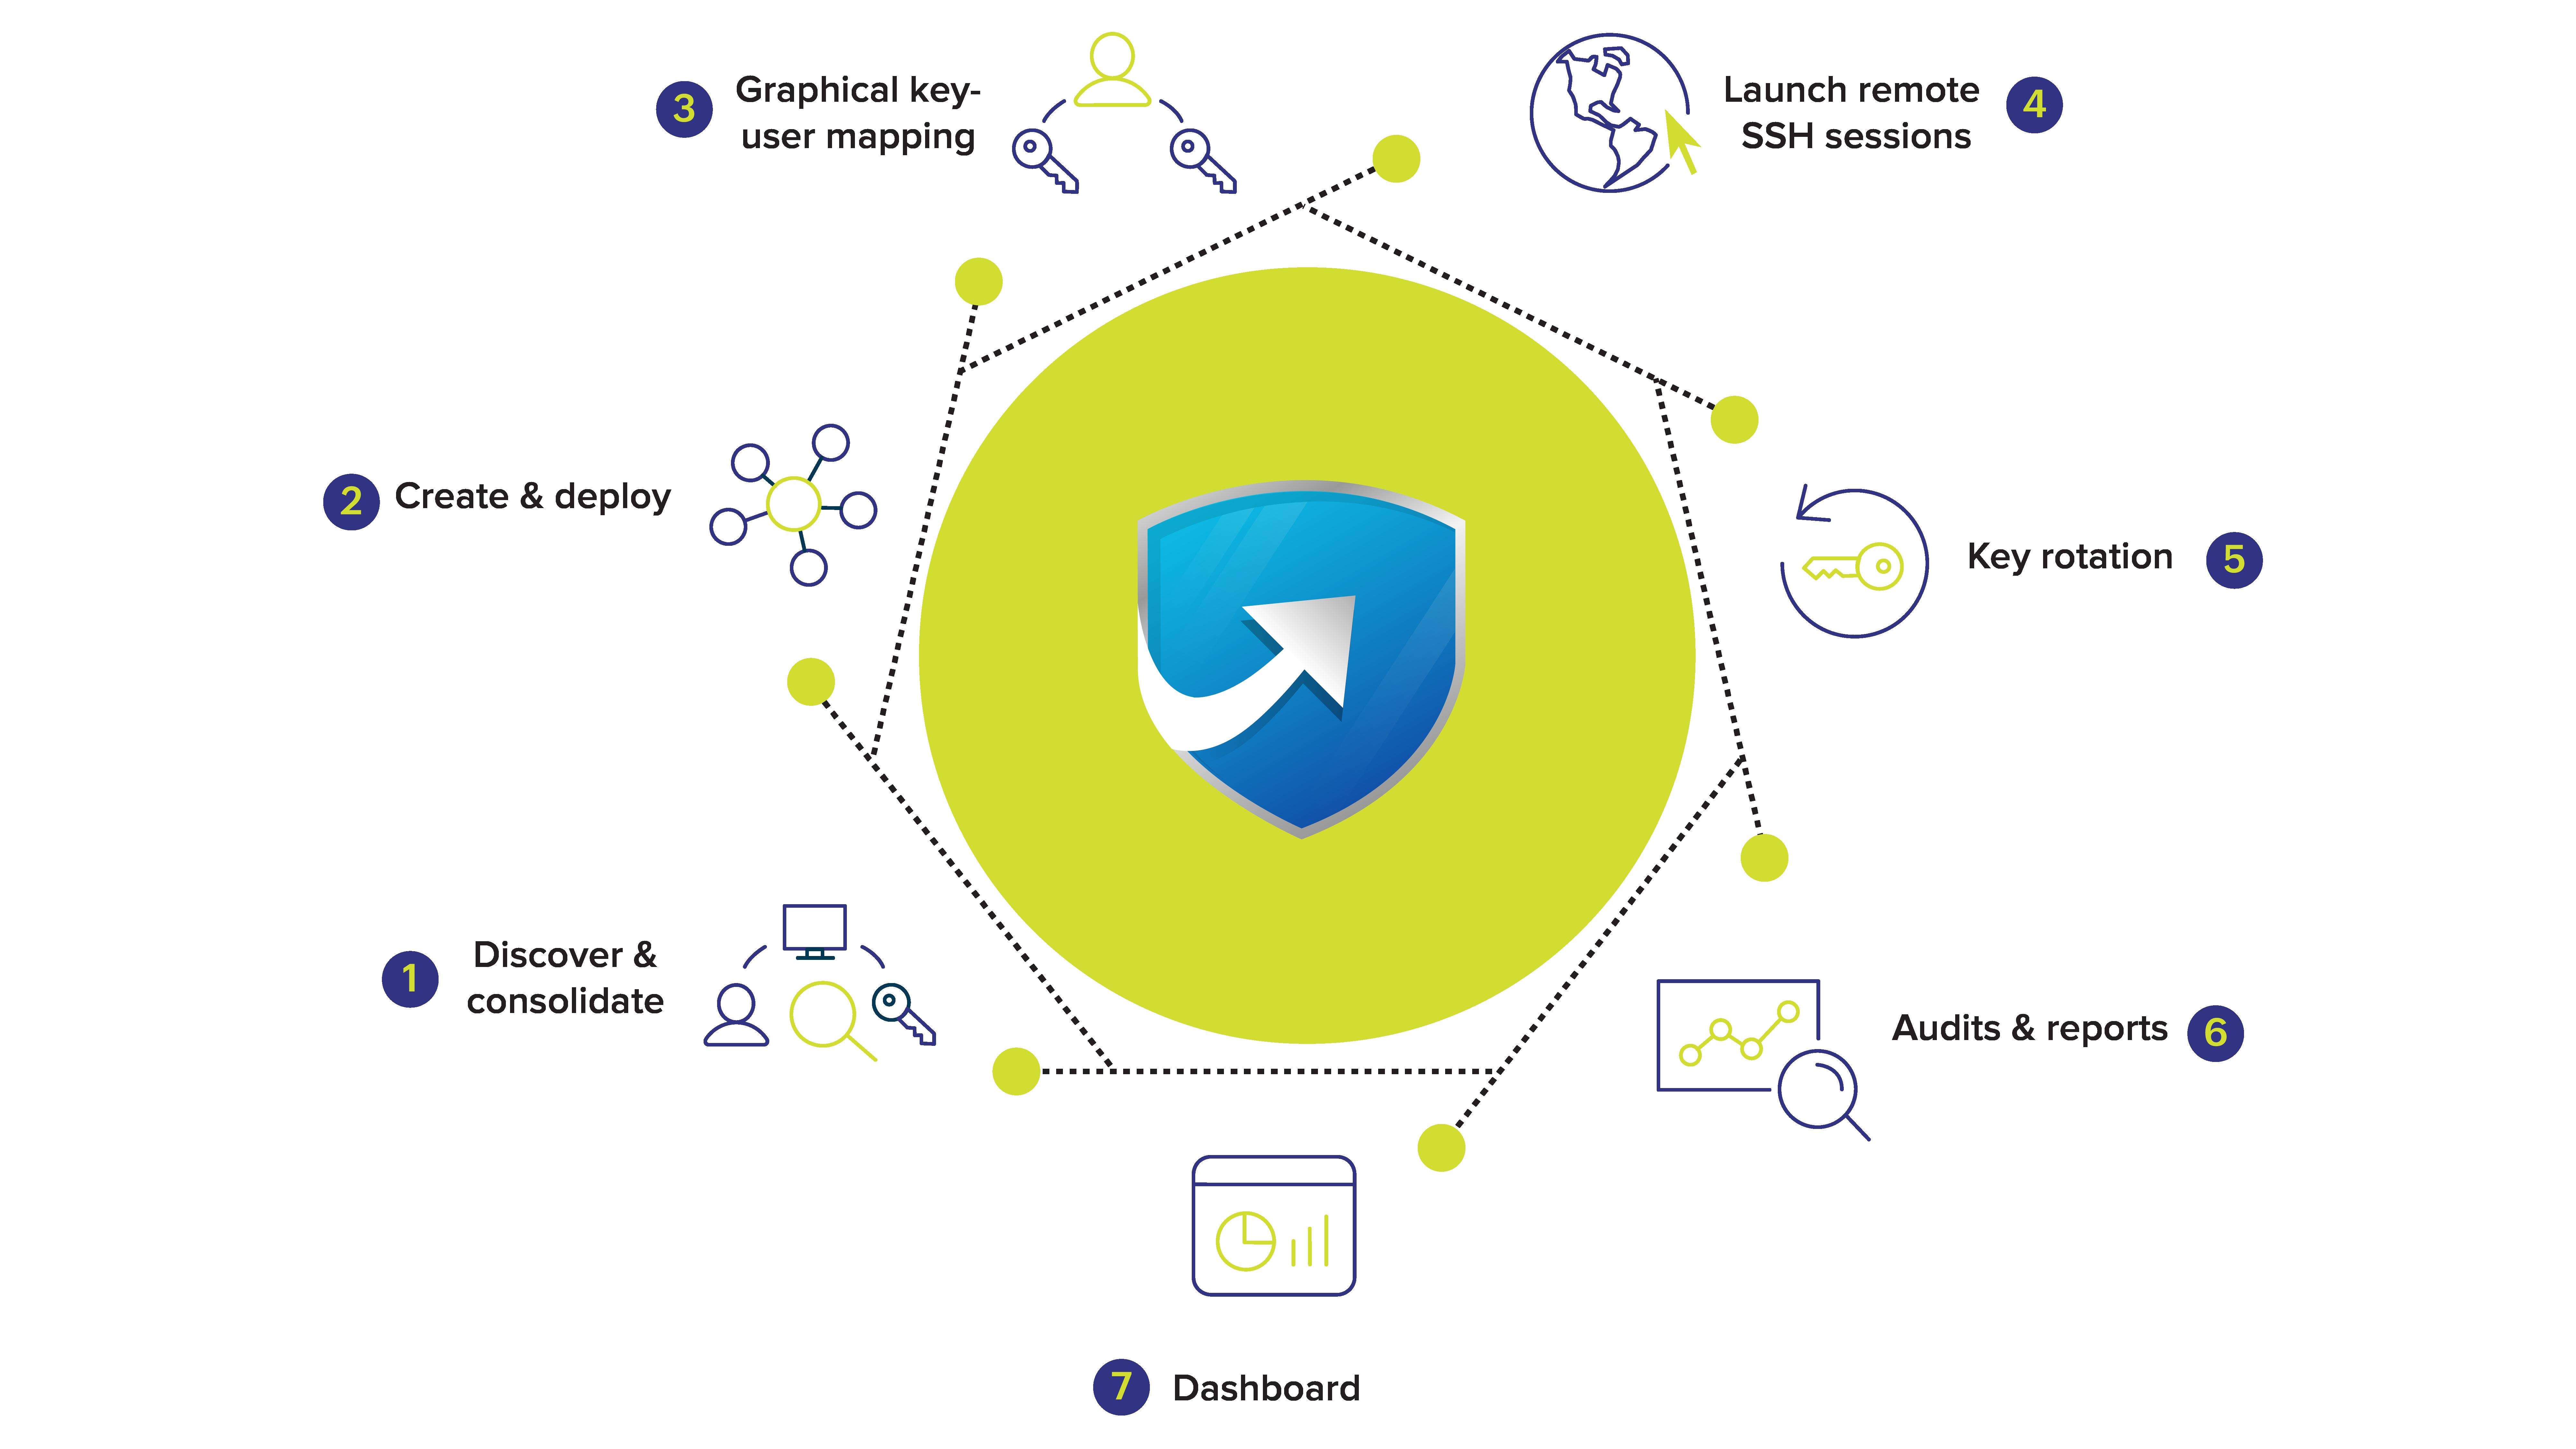 SSL/TLS certificate lifecycle management